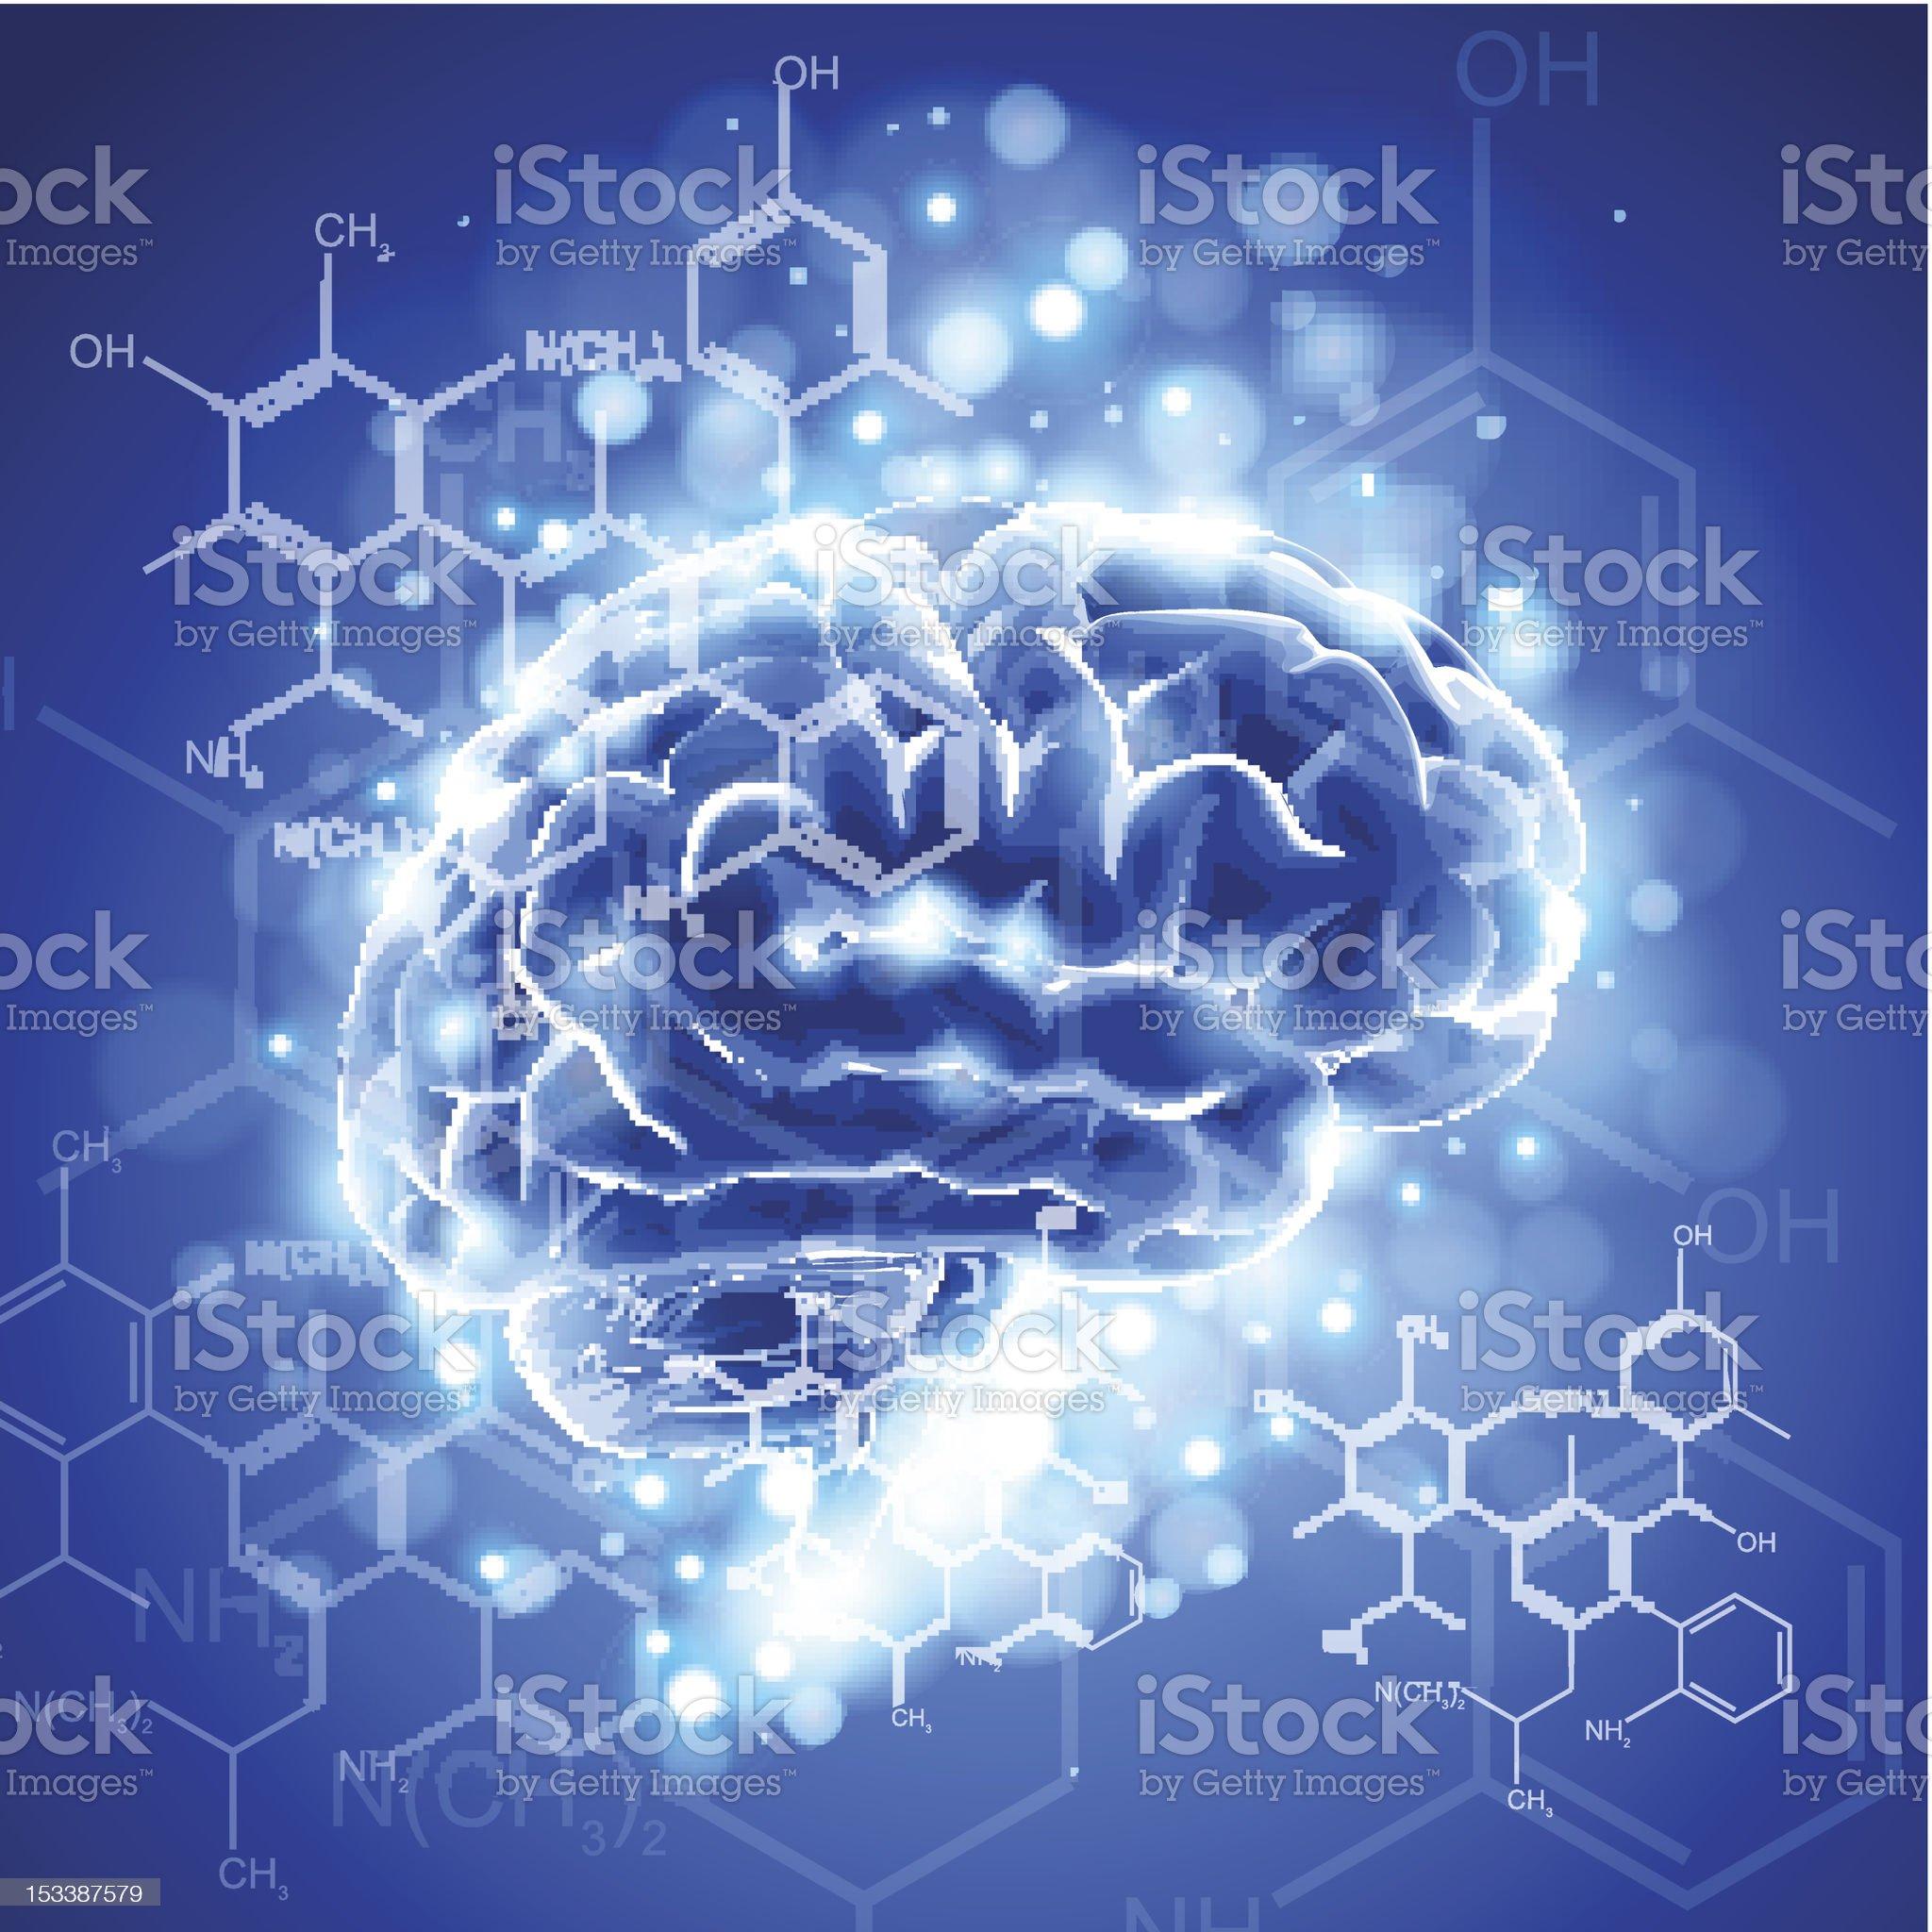 brain, chemical formulas & lights royalty-free stock vector art